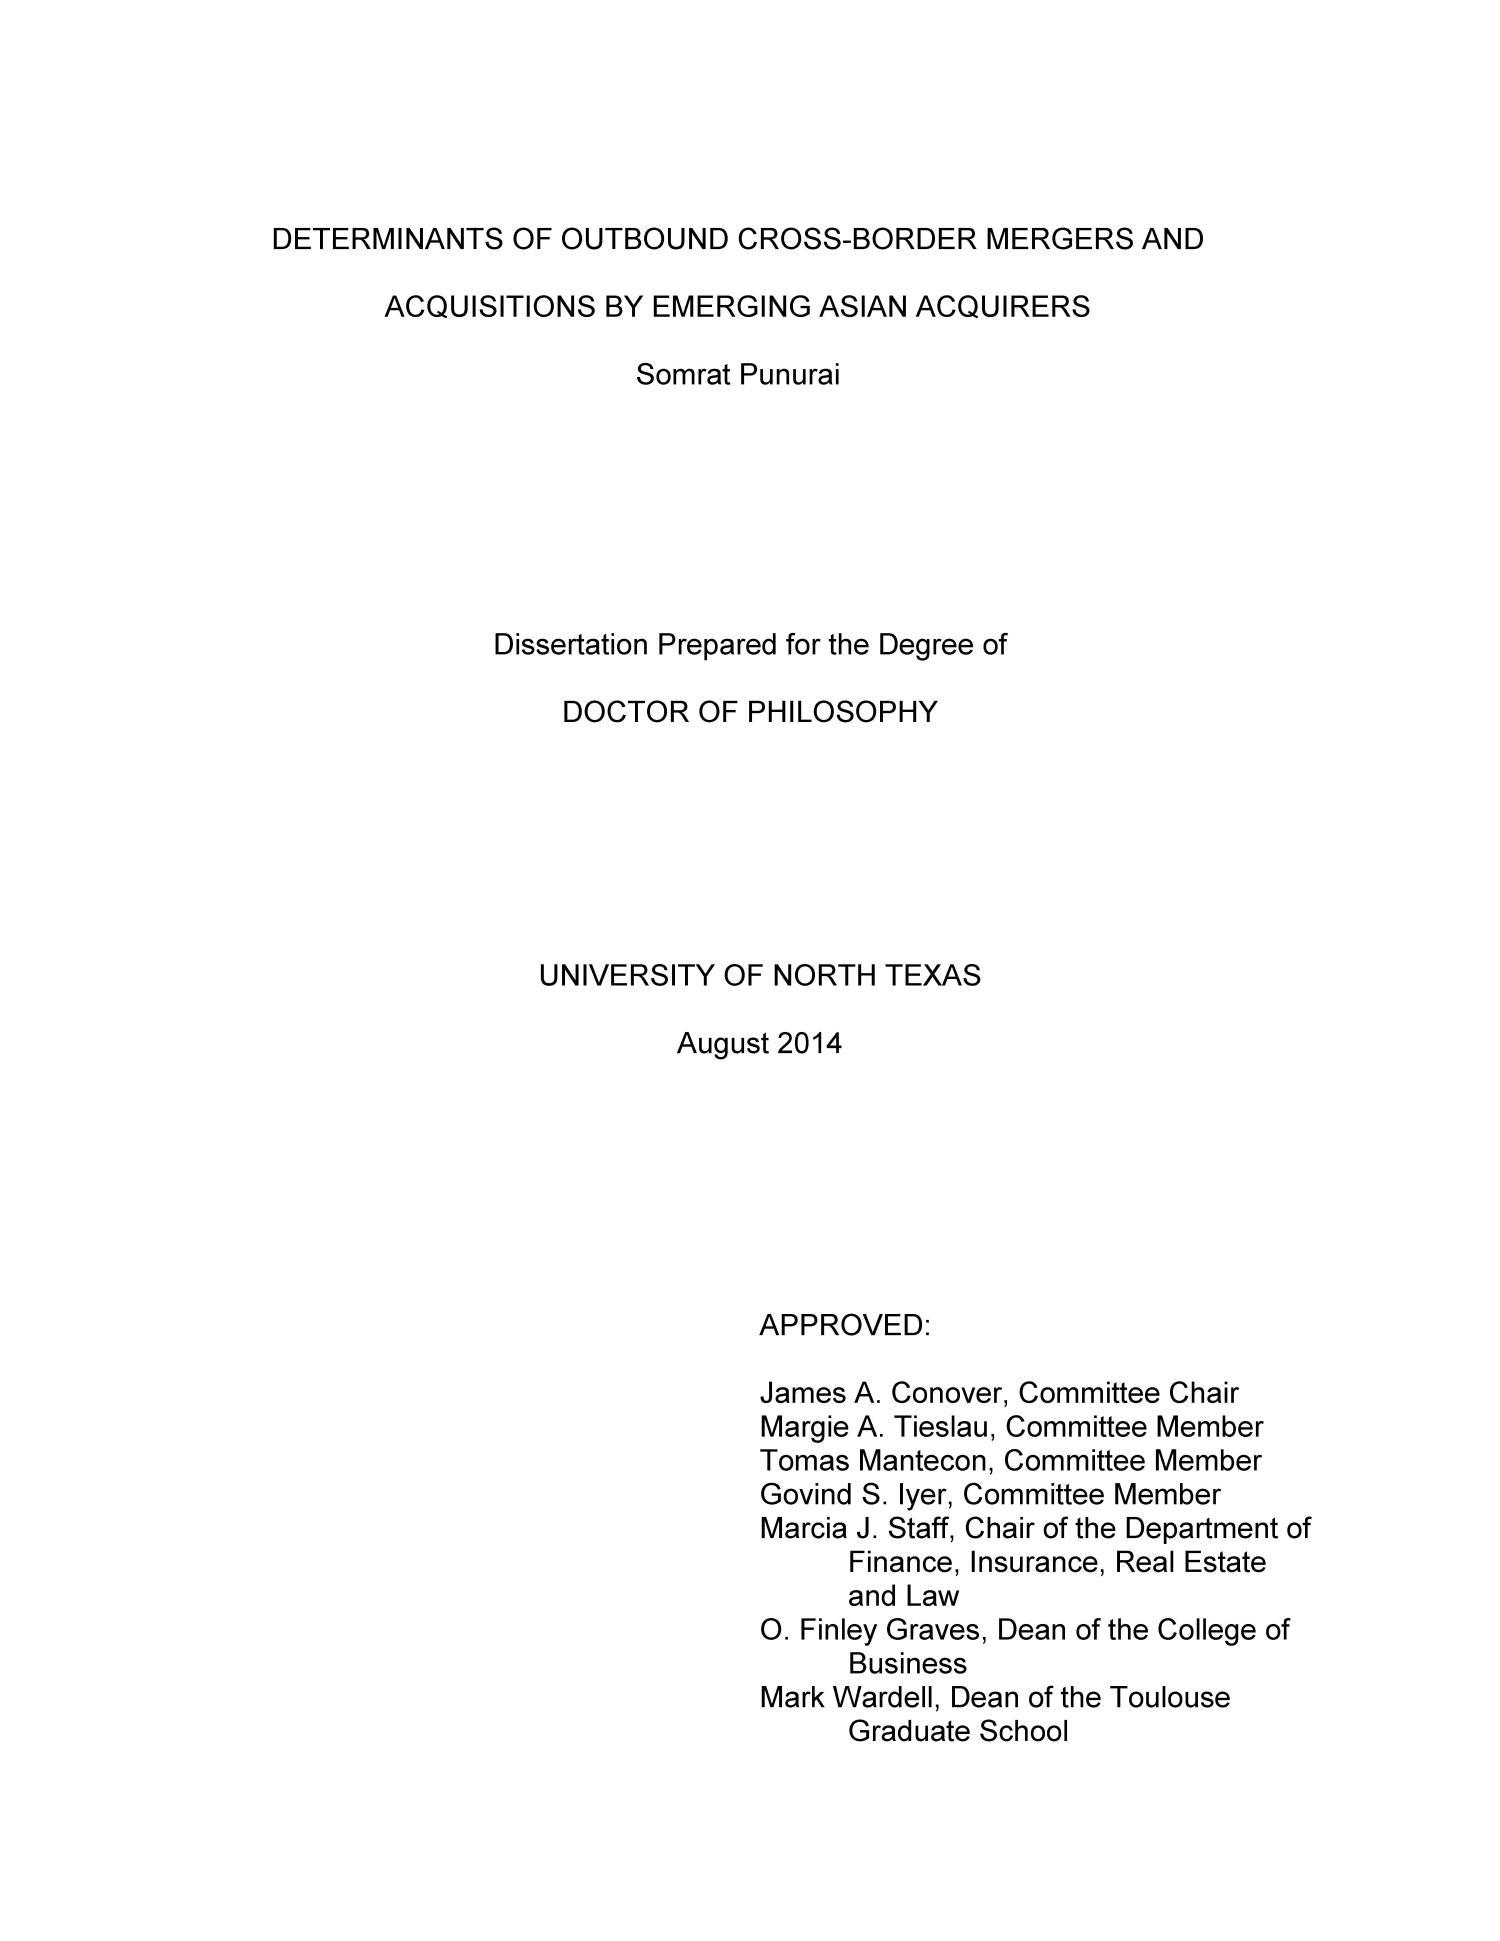 topic research paper business debatable